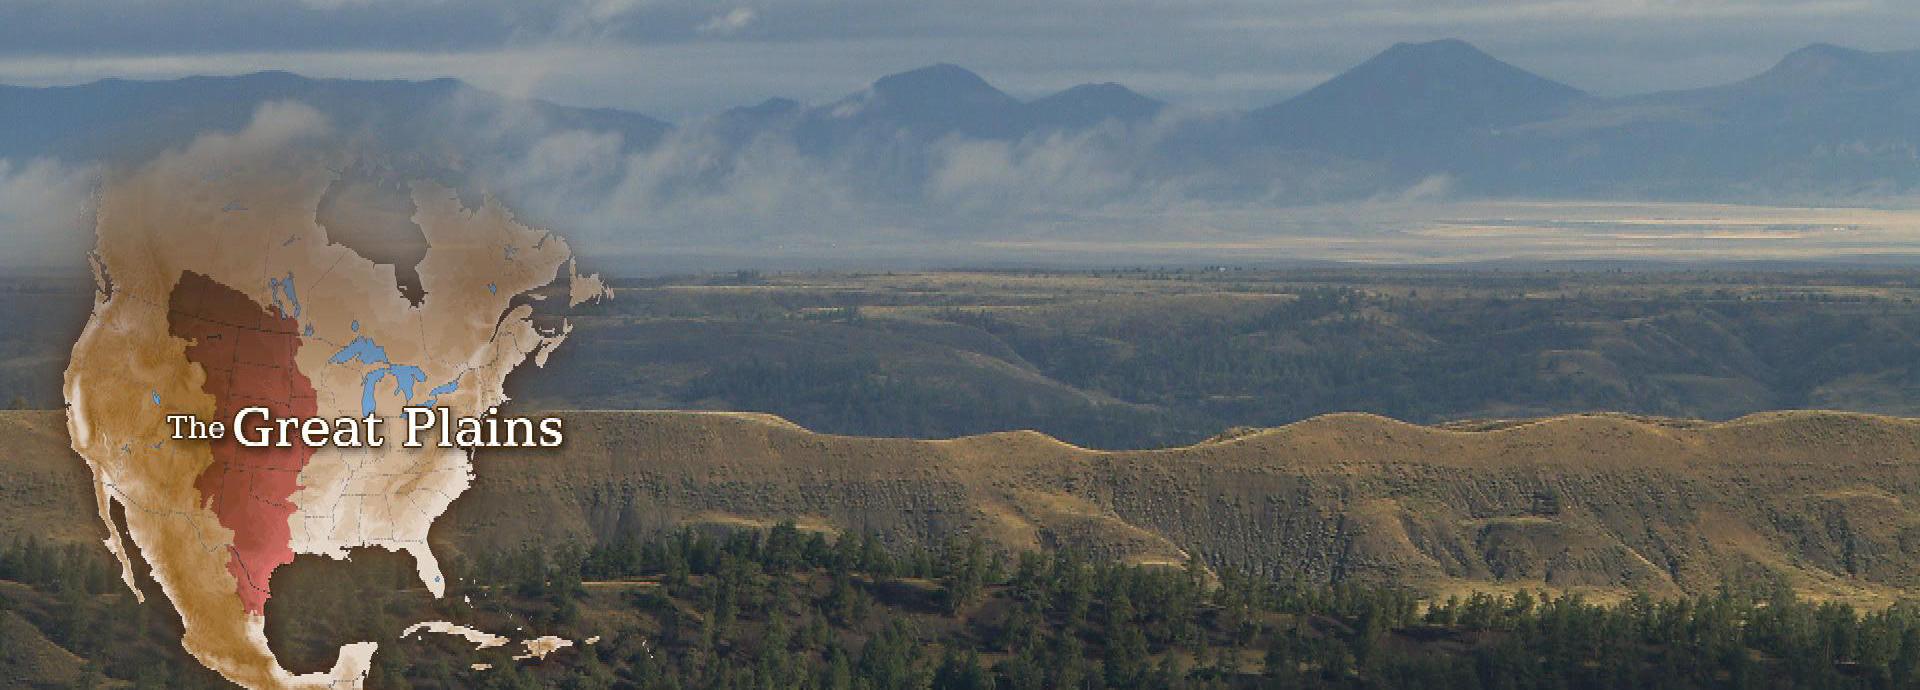 Great Plains map and landscape